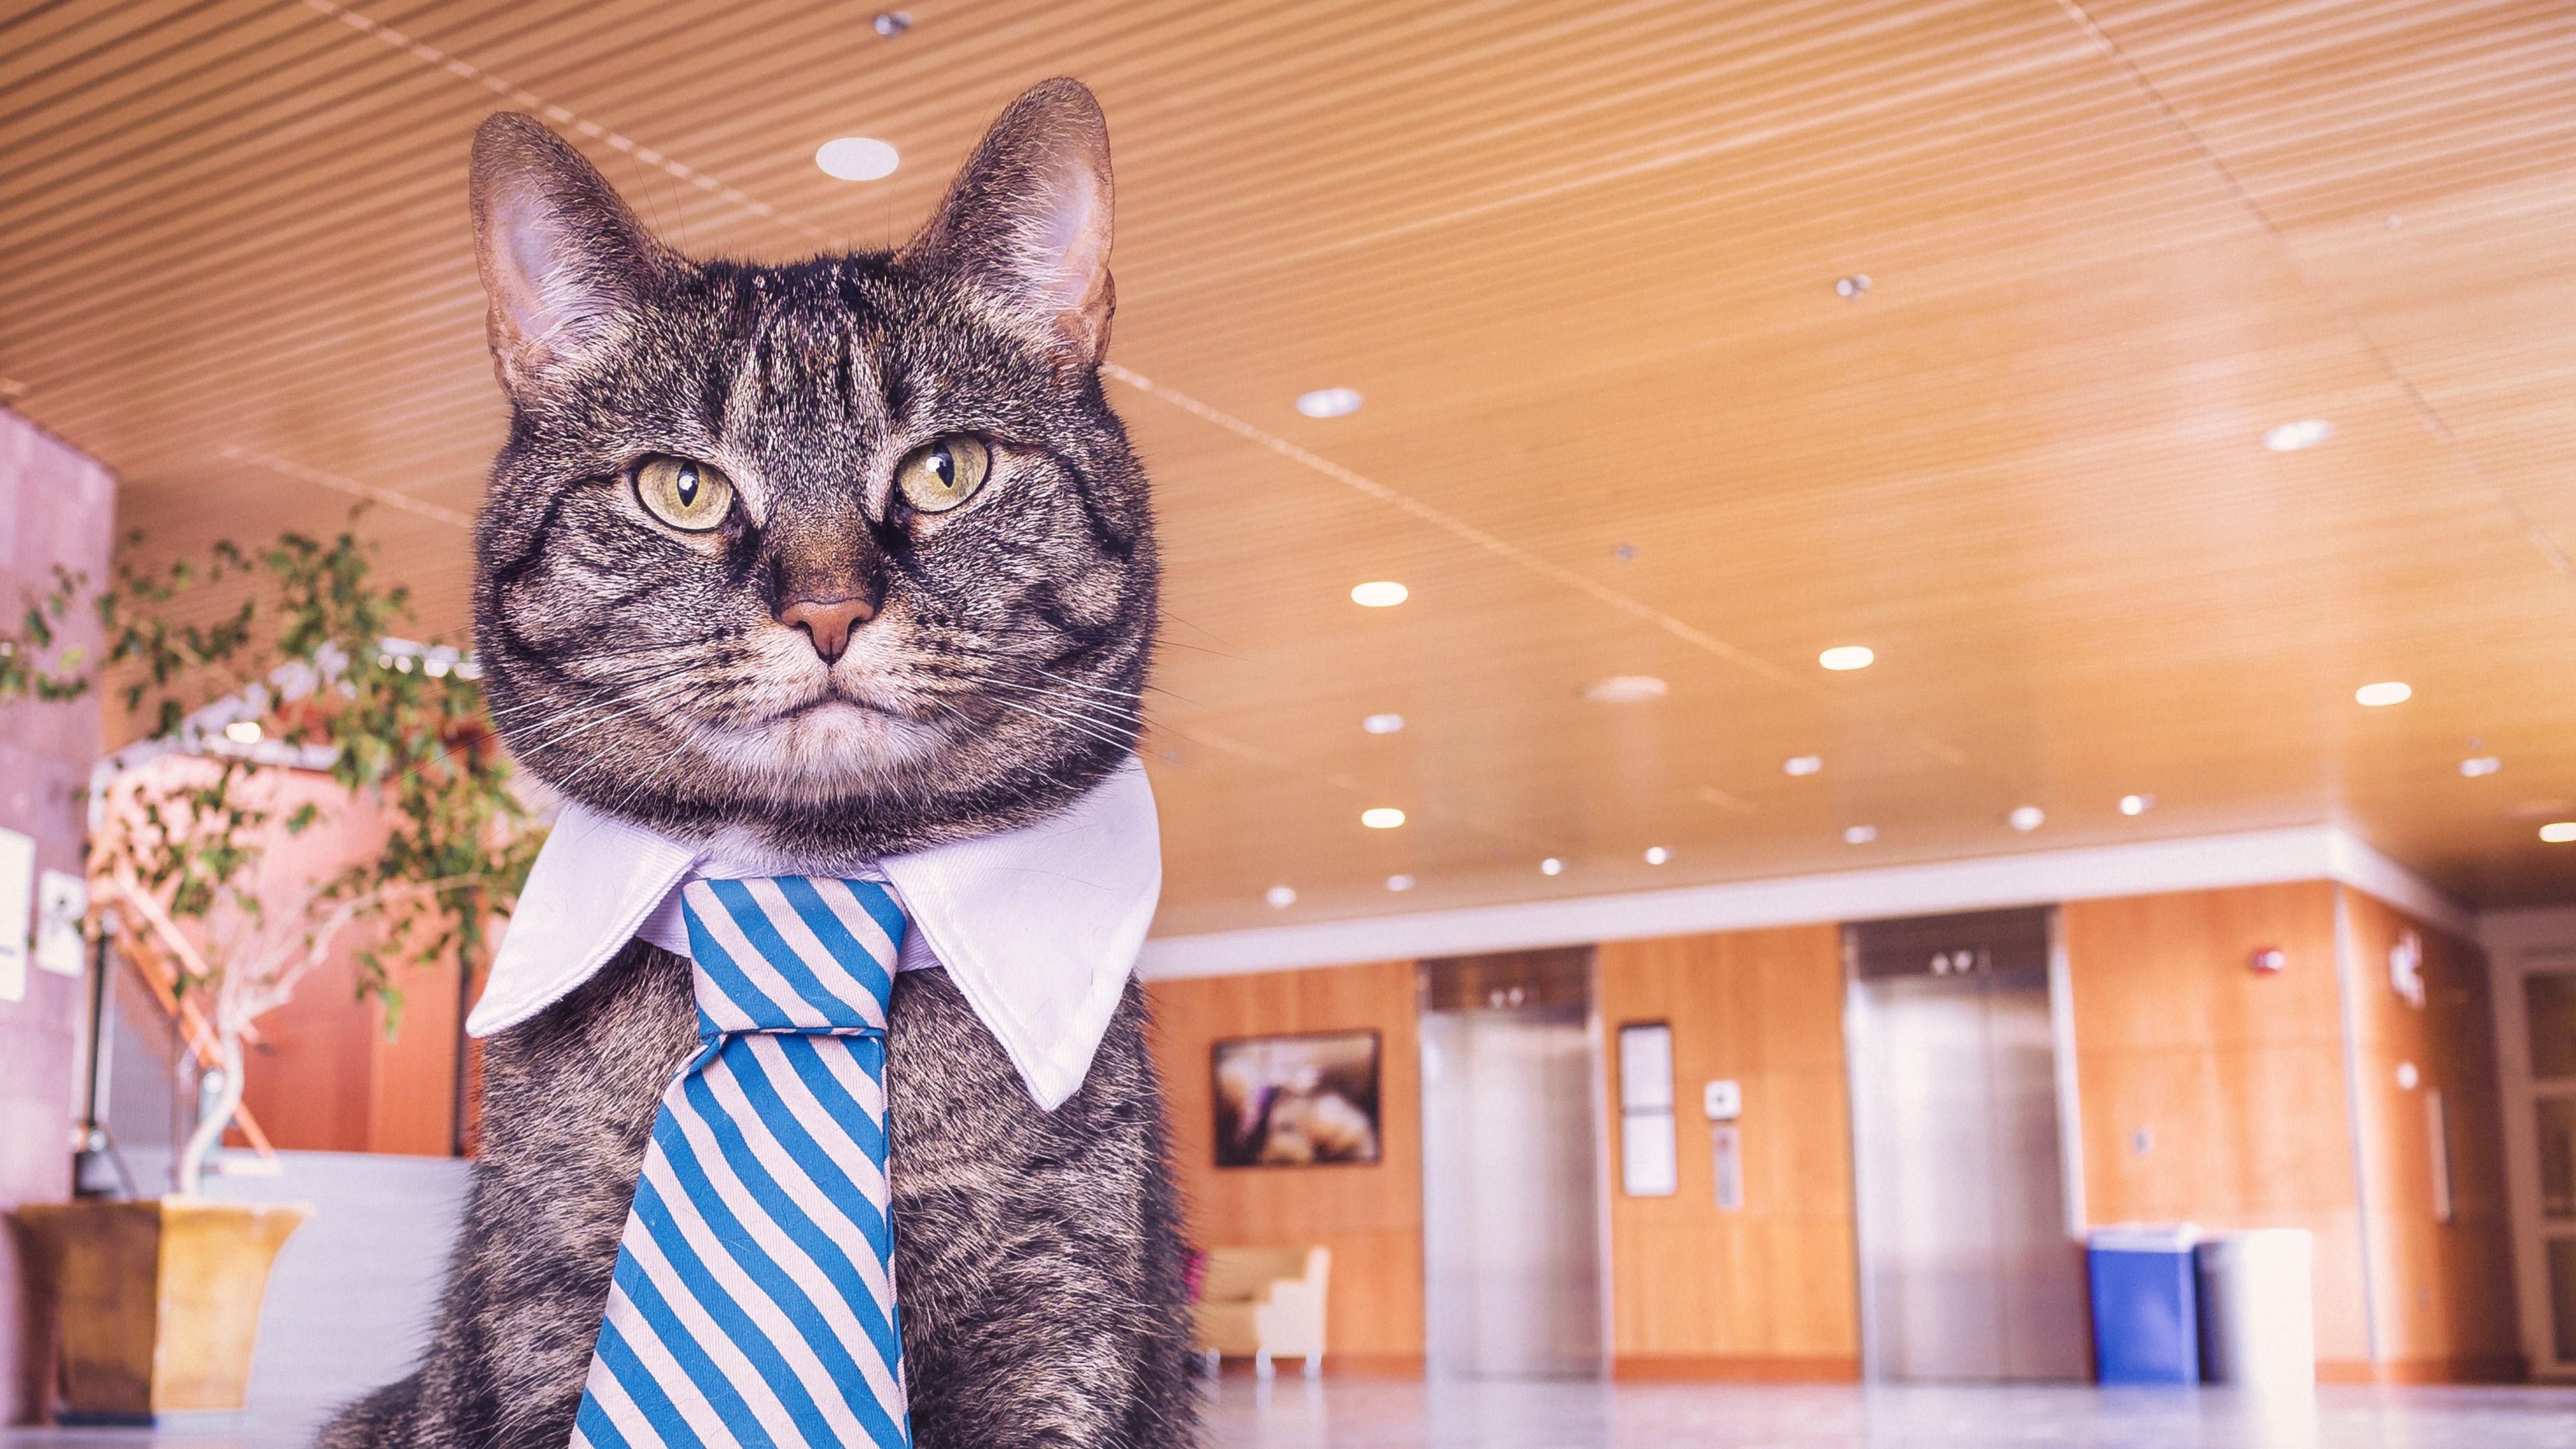 cat muzzle tie 4k 1542241457 - cat, muzzle, tie 4k - tie, muzzle, Cat